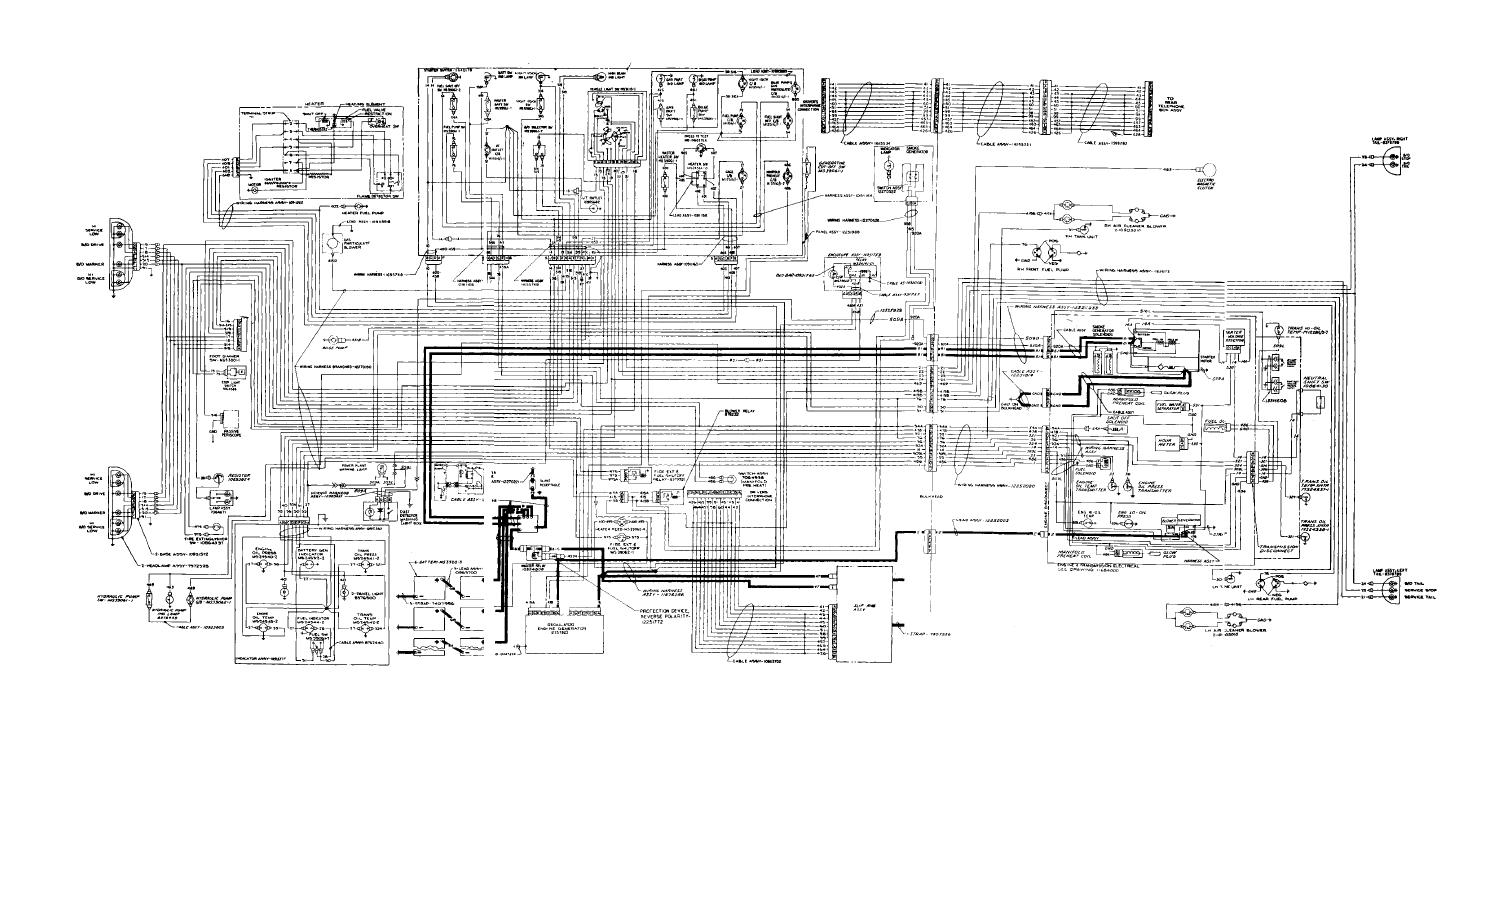 hight resolution of john deere 2350 light switch wiring diagram smart light 5425 john deere light switch diagram john deere wiring diagrams